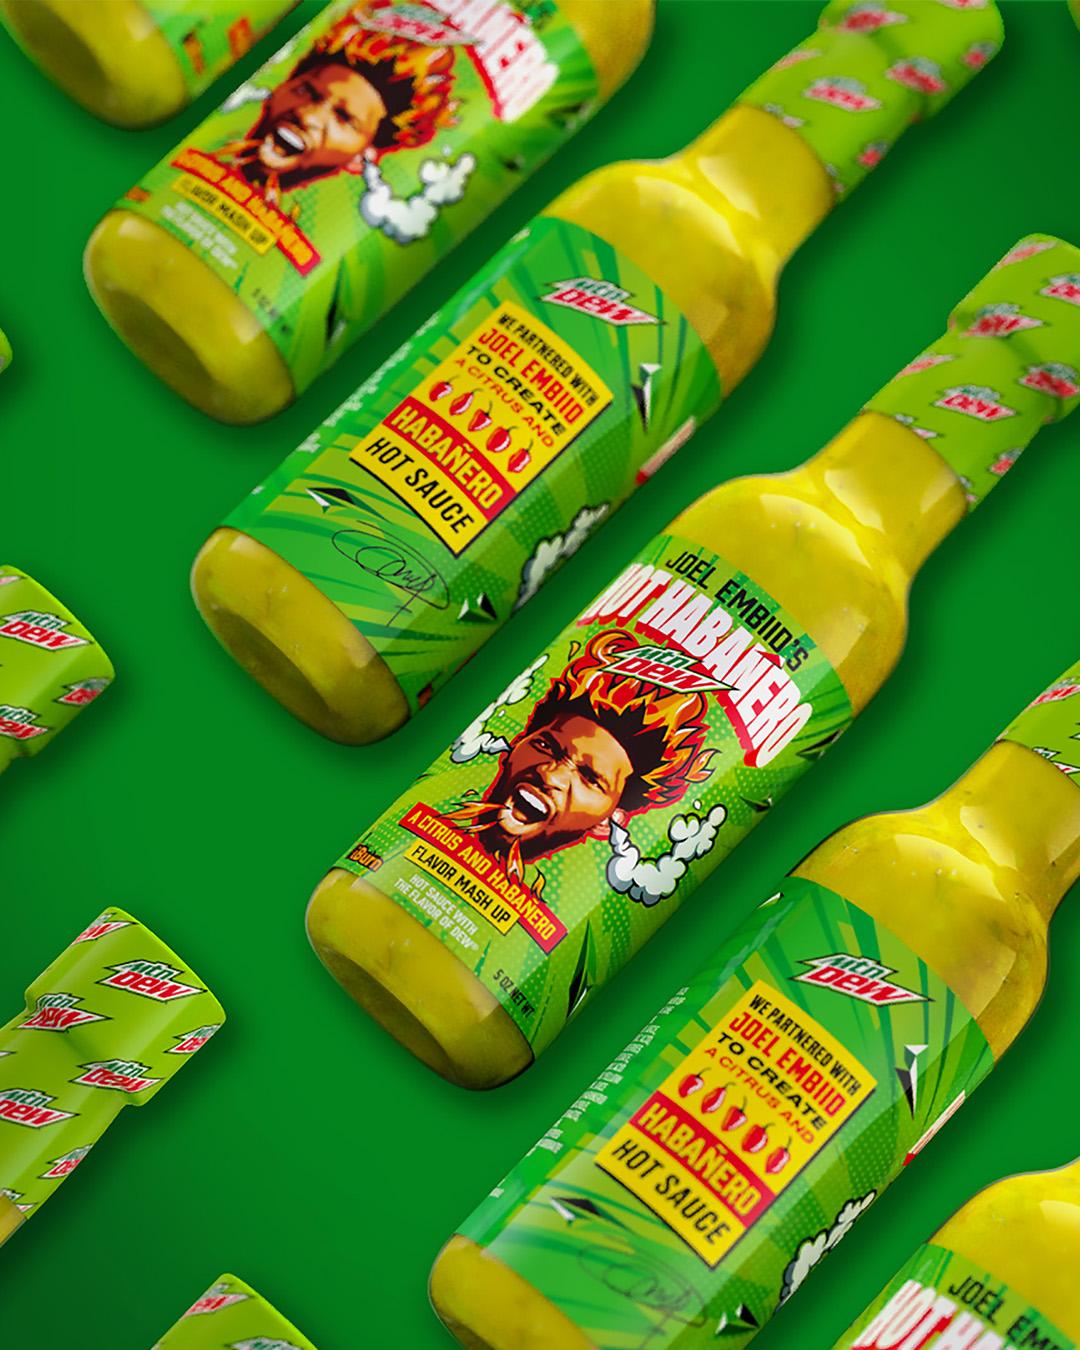 joel-embiid-mountain-dew-hot-sauce